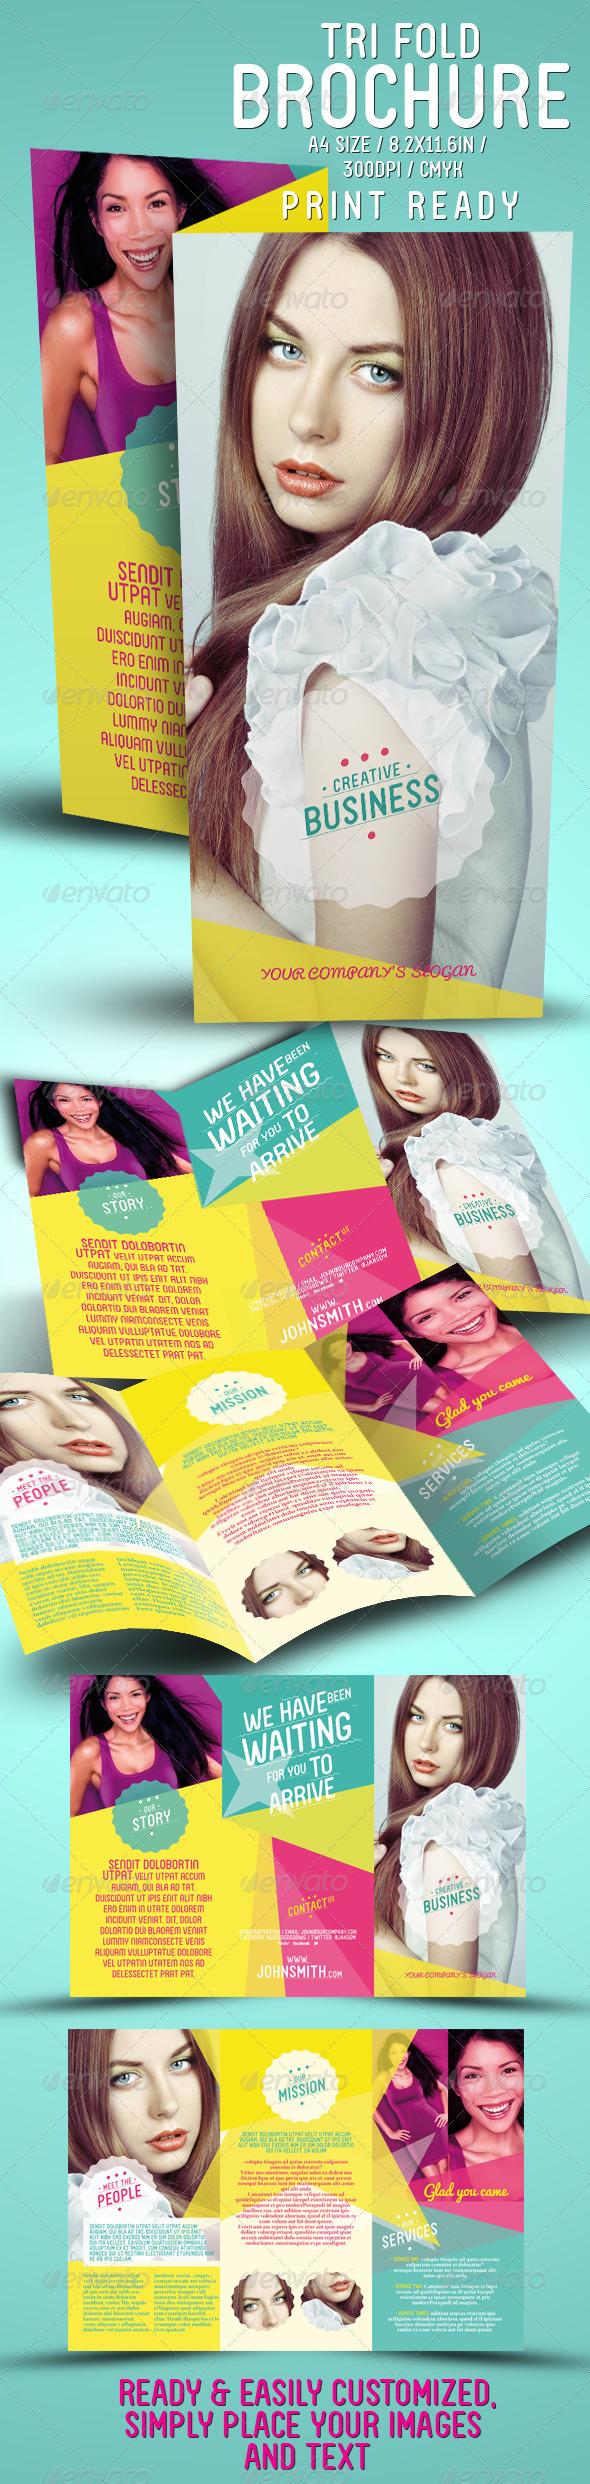 Creative Tri Fold Brochure - Brochures Print Templates